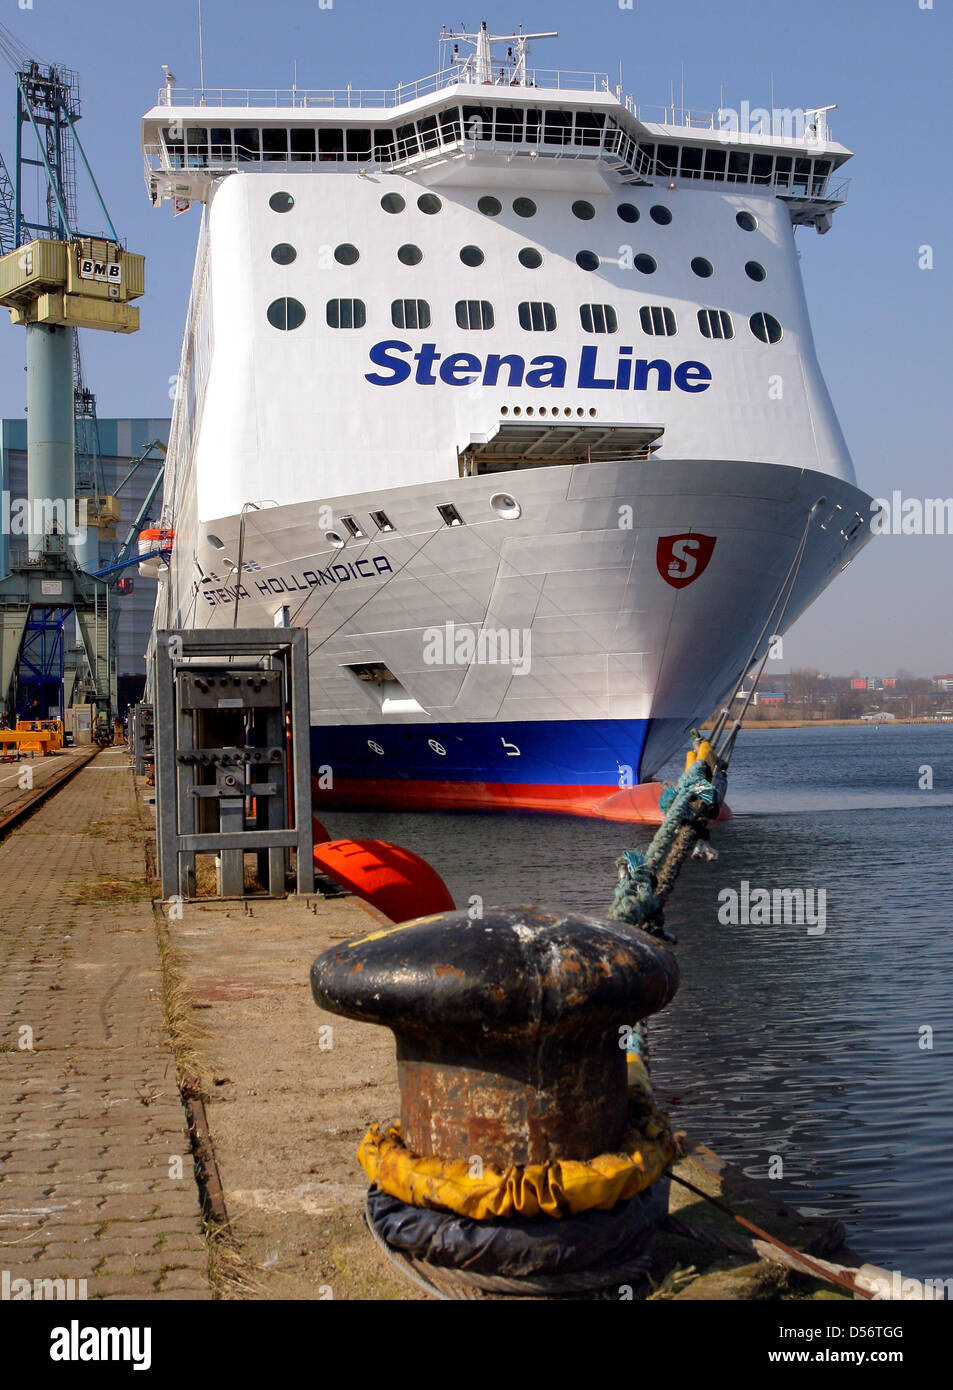 The world's biggest cargo passenger ferry ship 'Stena Hollandica' of